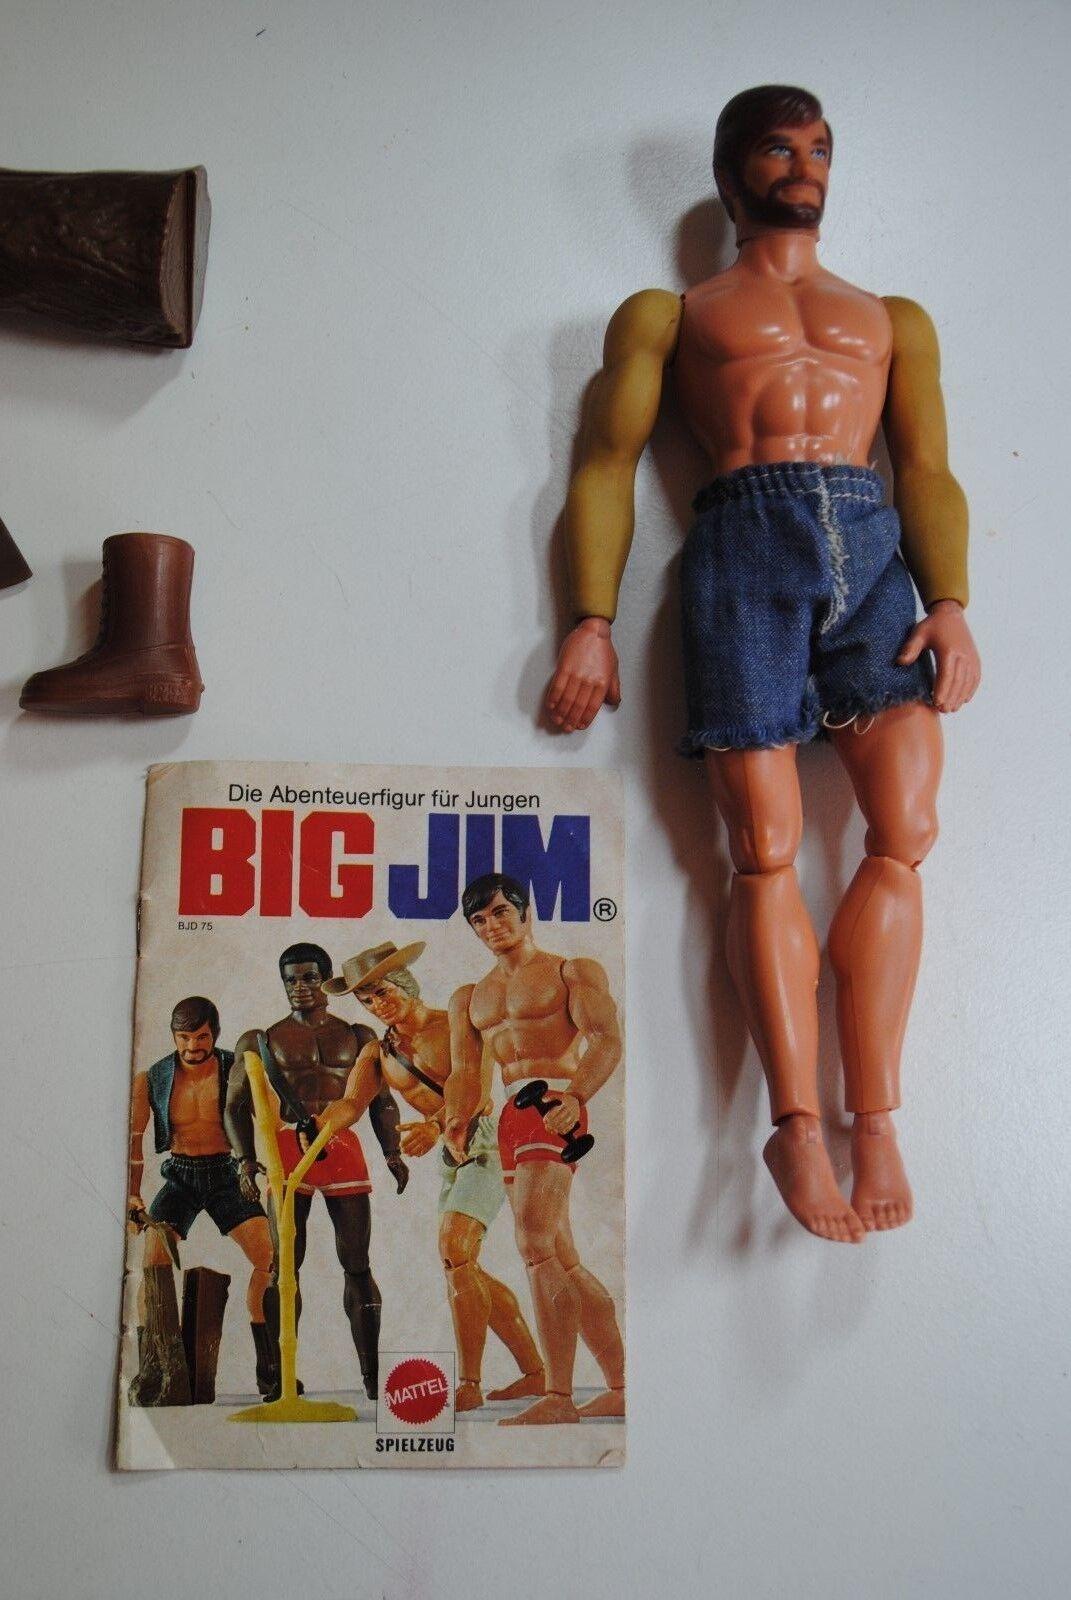 Big jim mattel  big josh  gerade hand figur, nizza